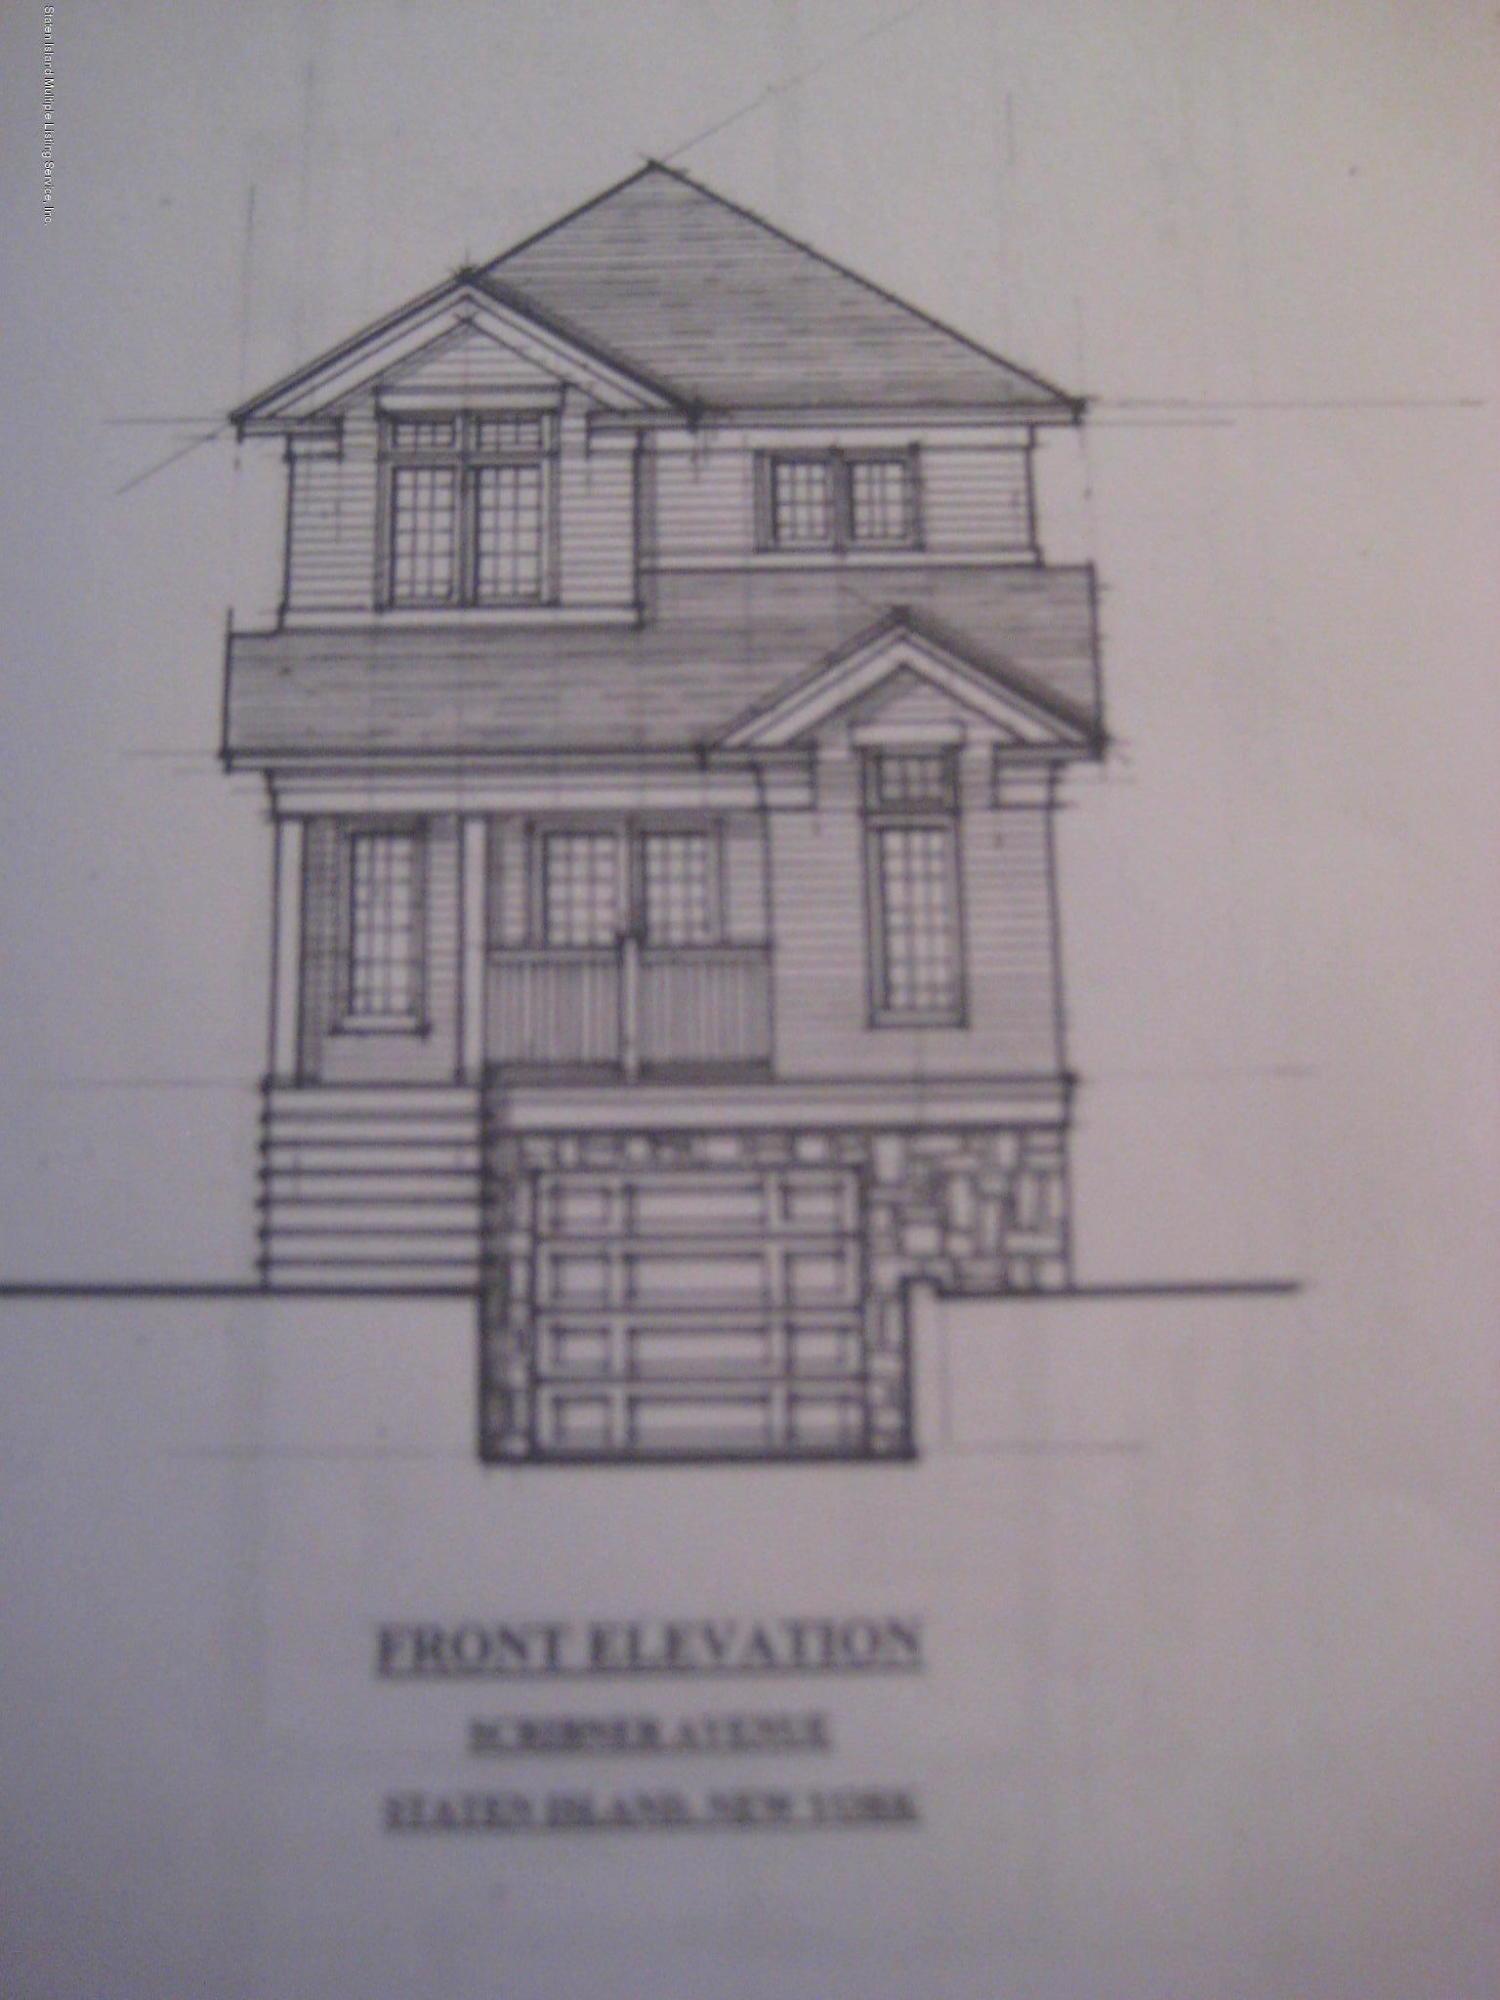 Single Family - Detached 28 Scribner Avenue  Staten Island, NY 10301, MLS-1130251-4